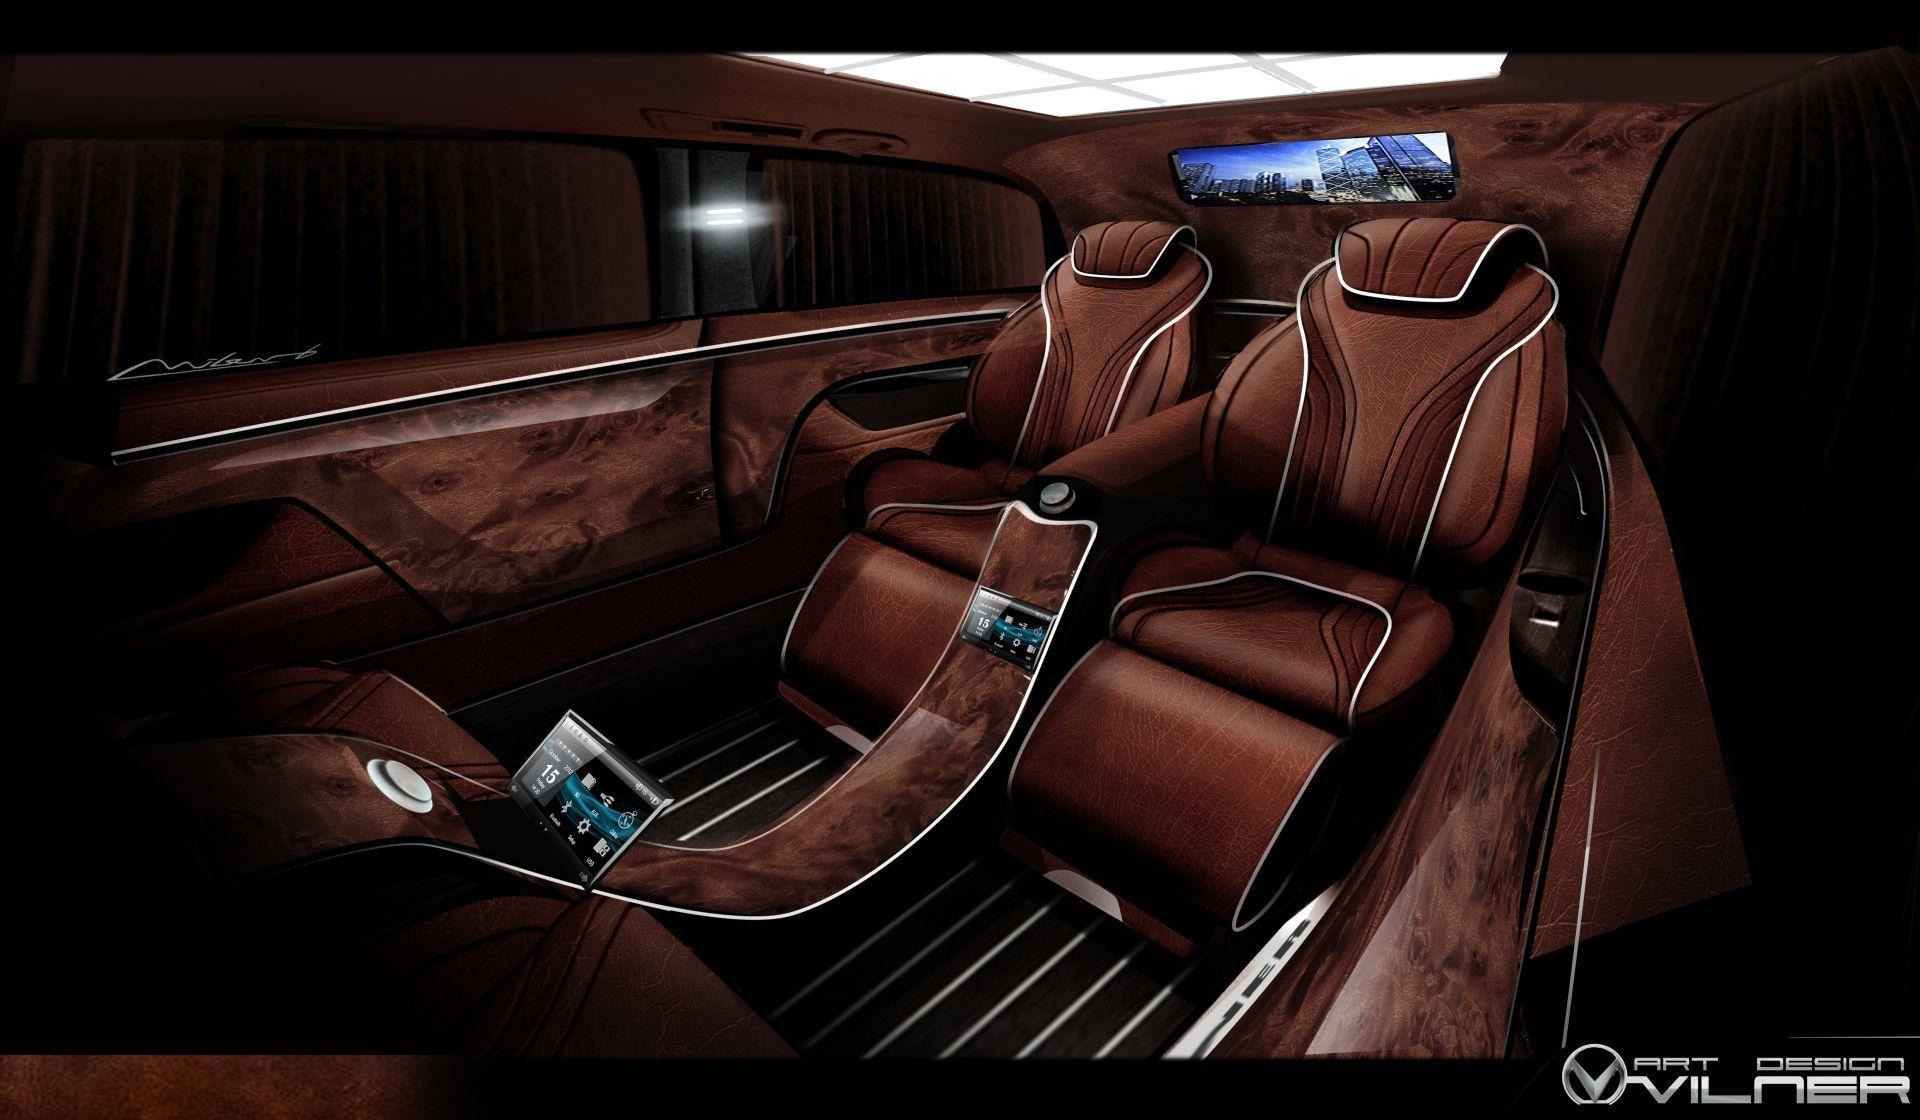 Vilner Mercedes Viano Luxury car interior, Custom car